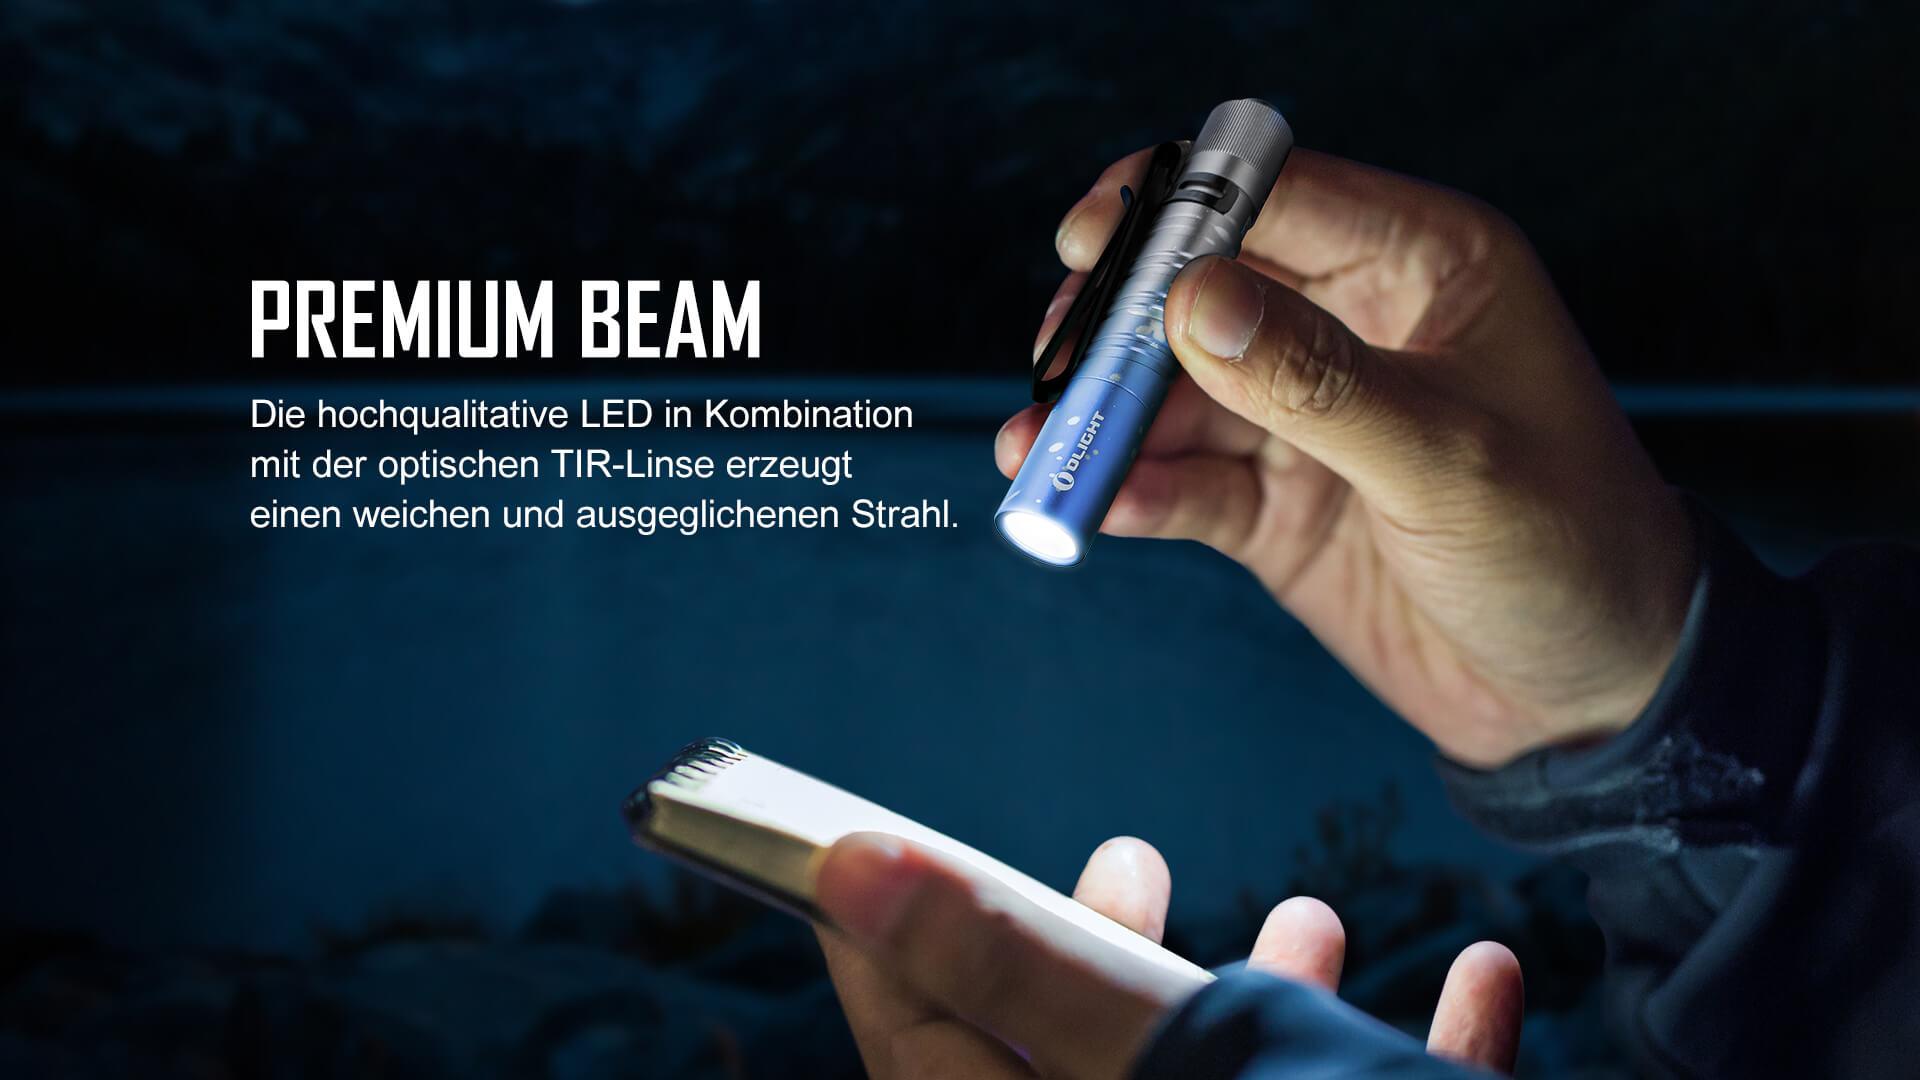 Olight I3T kleine LED-Taschenlampe